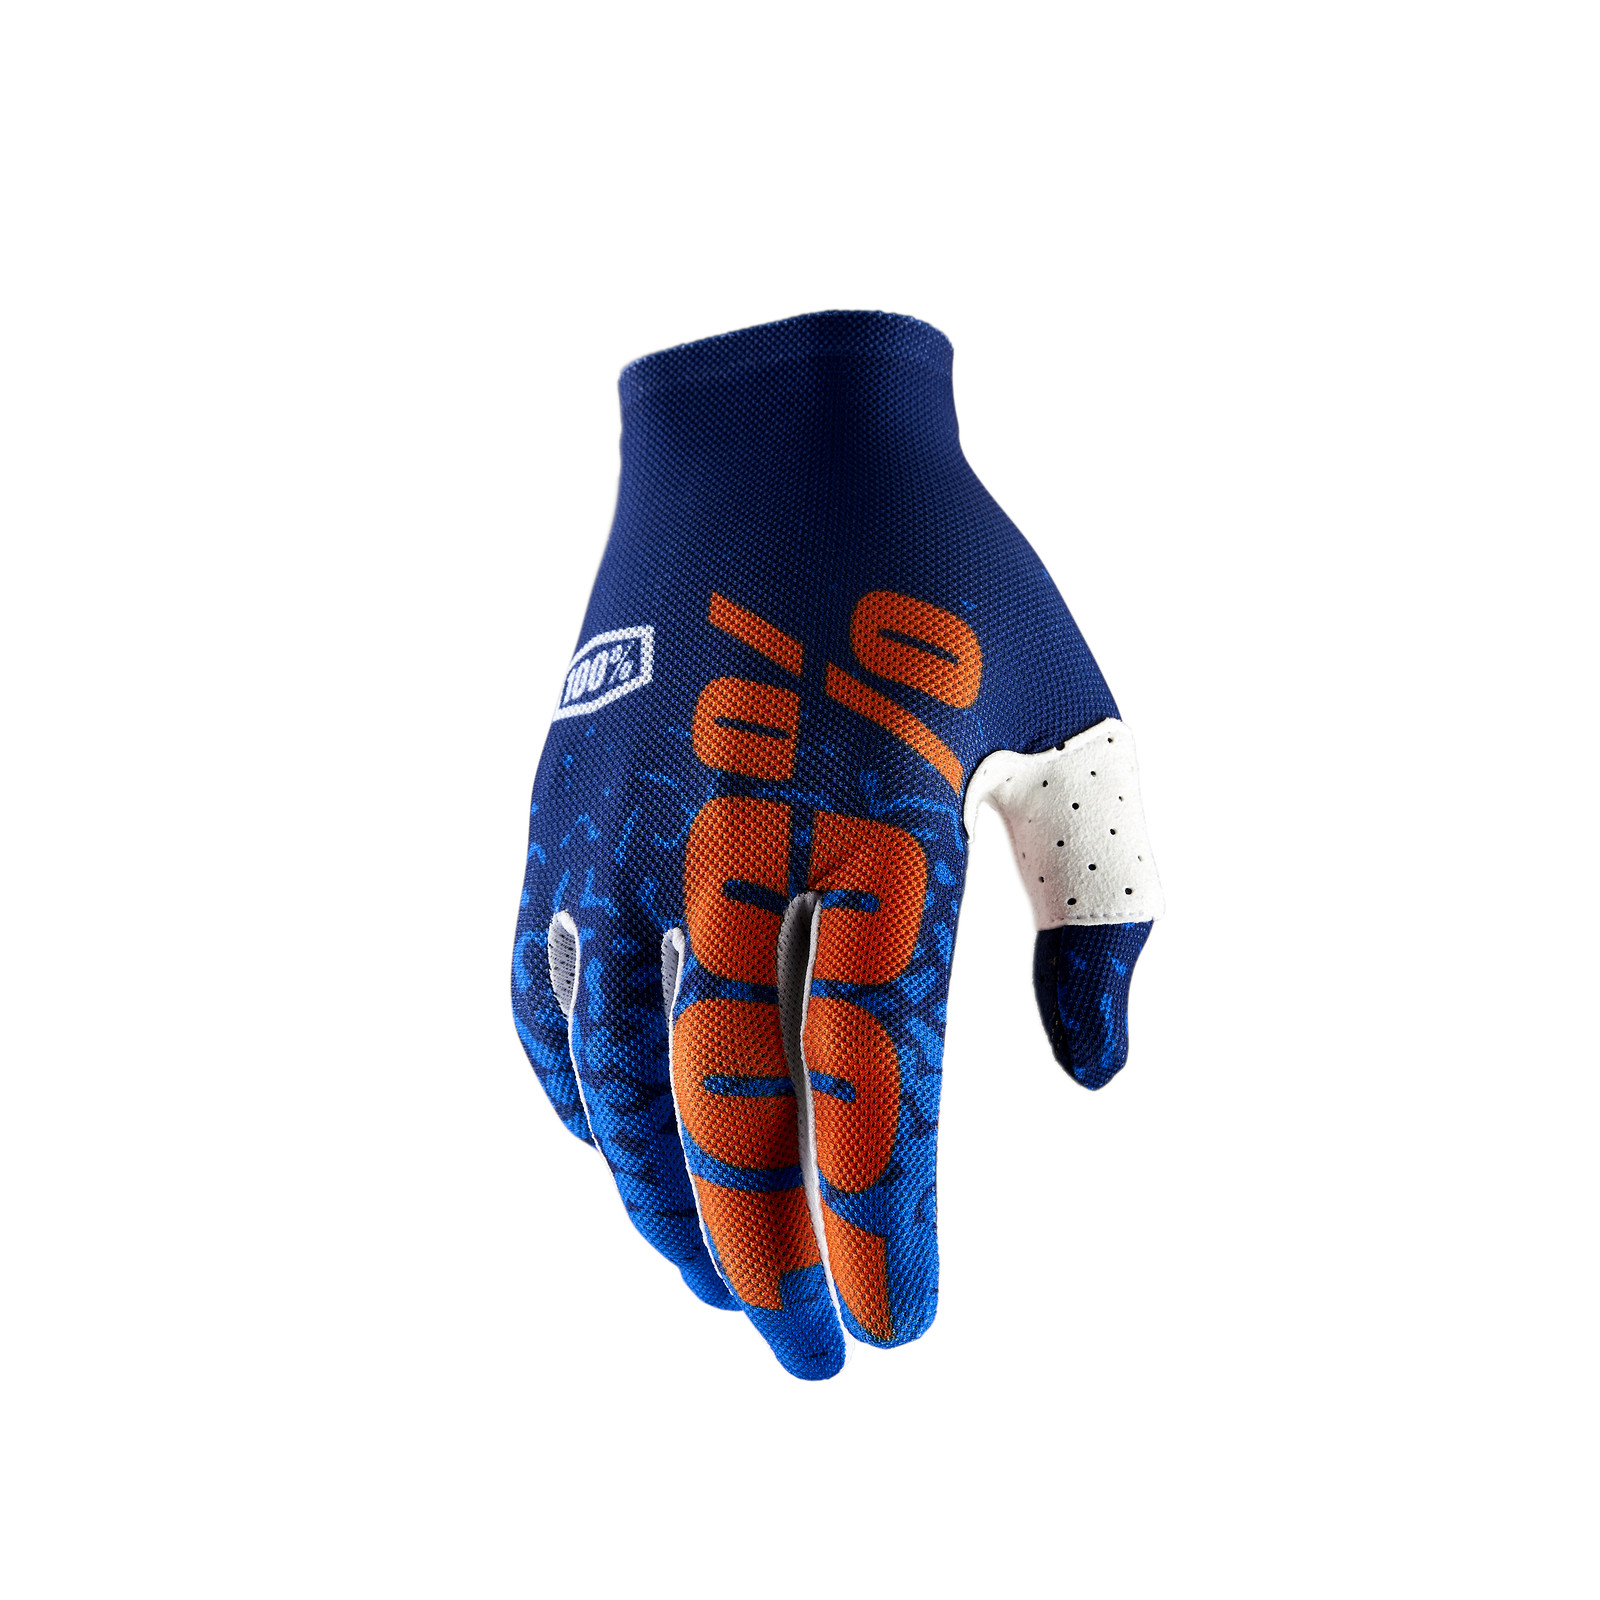 Celium 2 Glove - Flash Navy / Orage - 100percent - Motocross Pictures - Vital MX